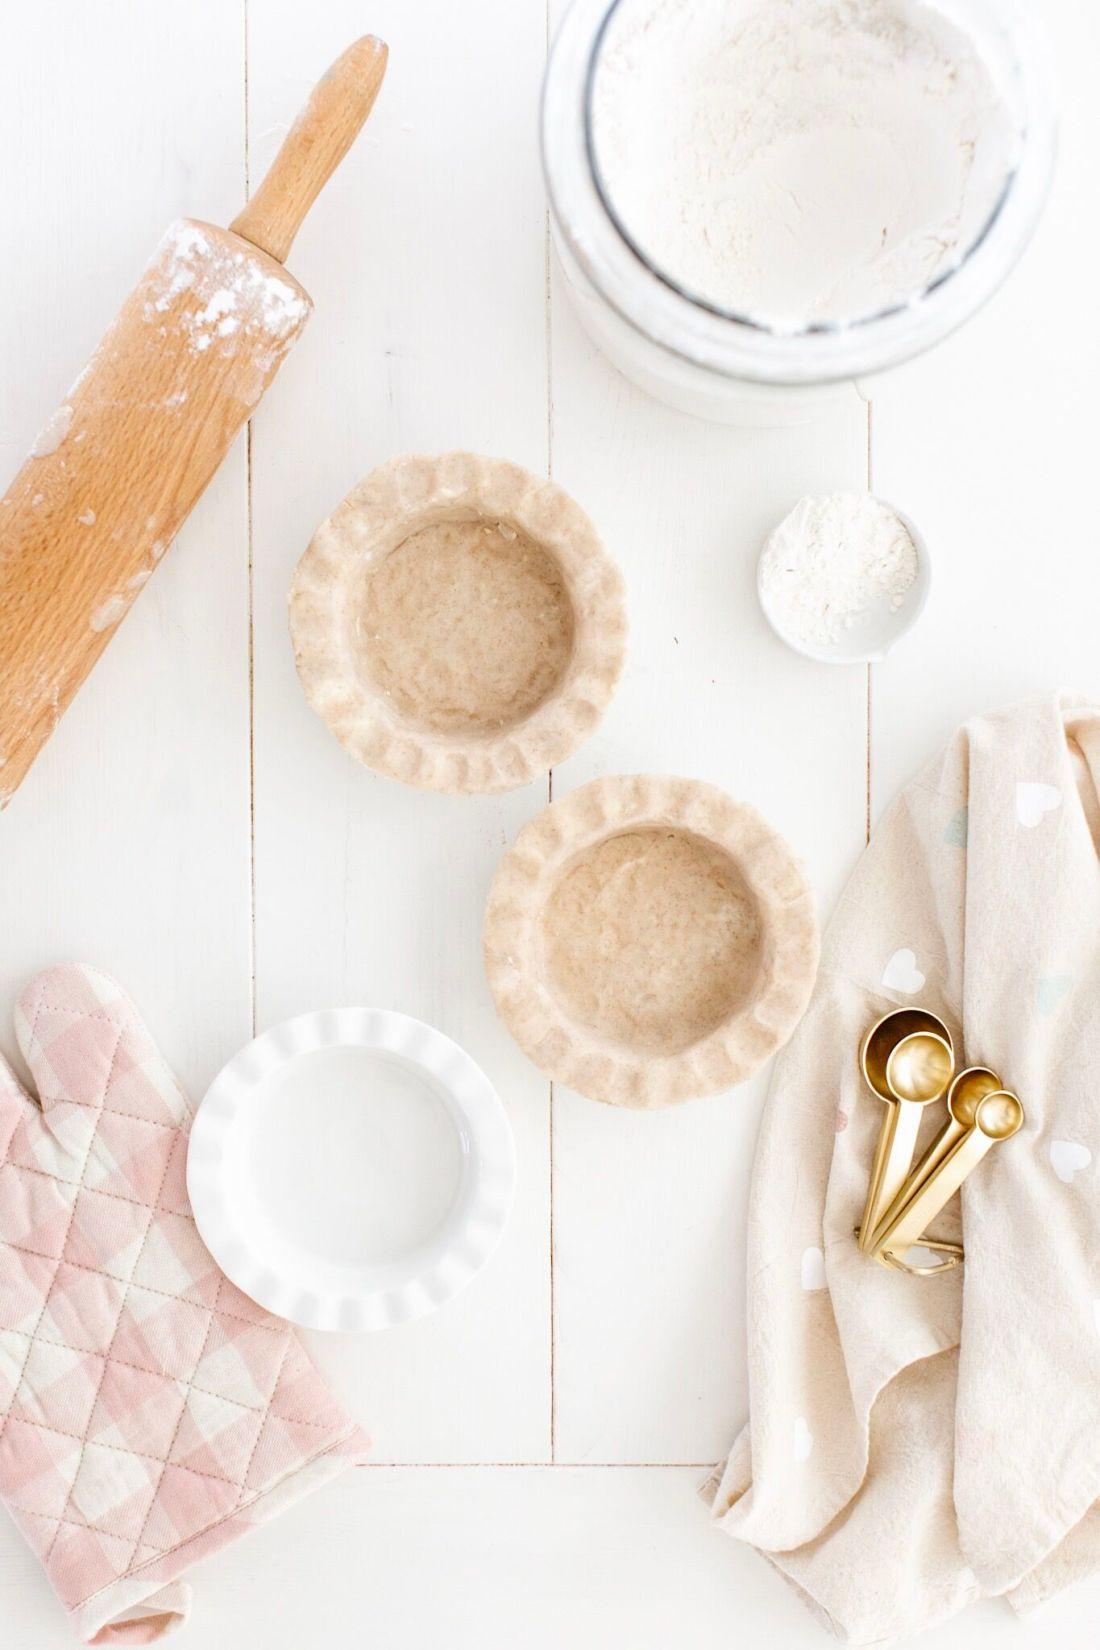 Gluten free pie crust recipe, gold measuring spoons